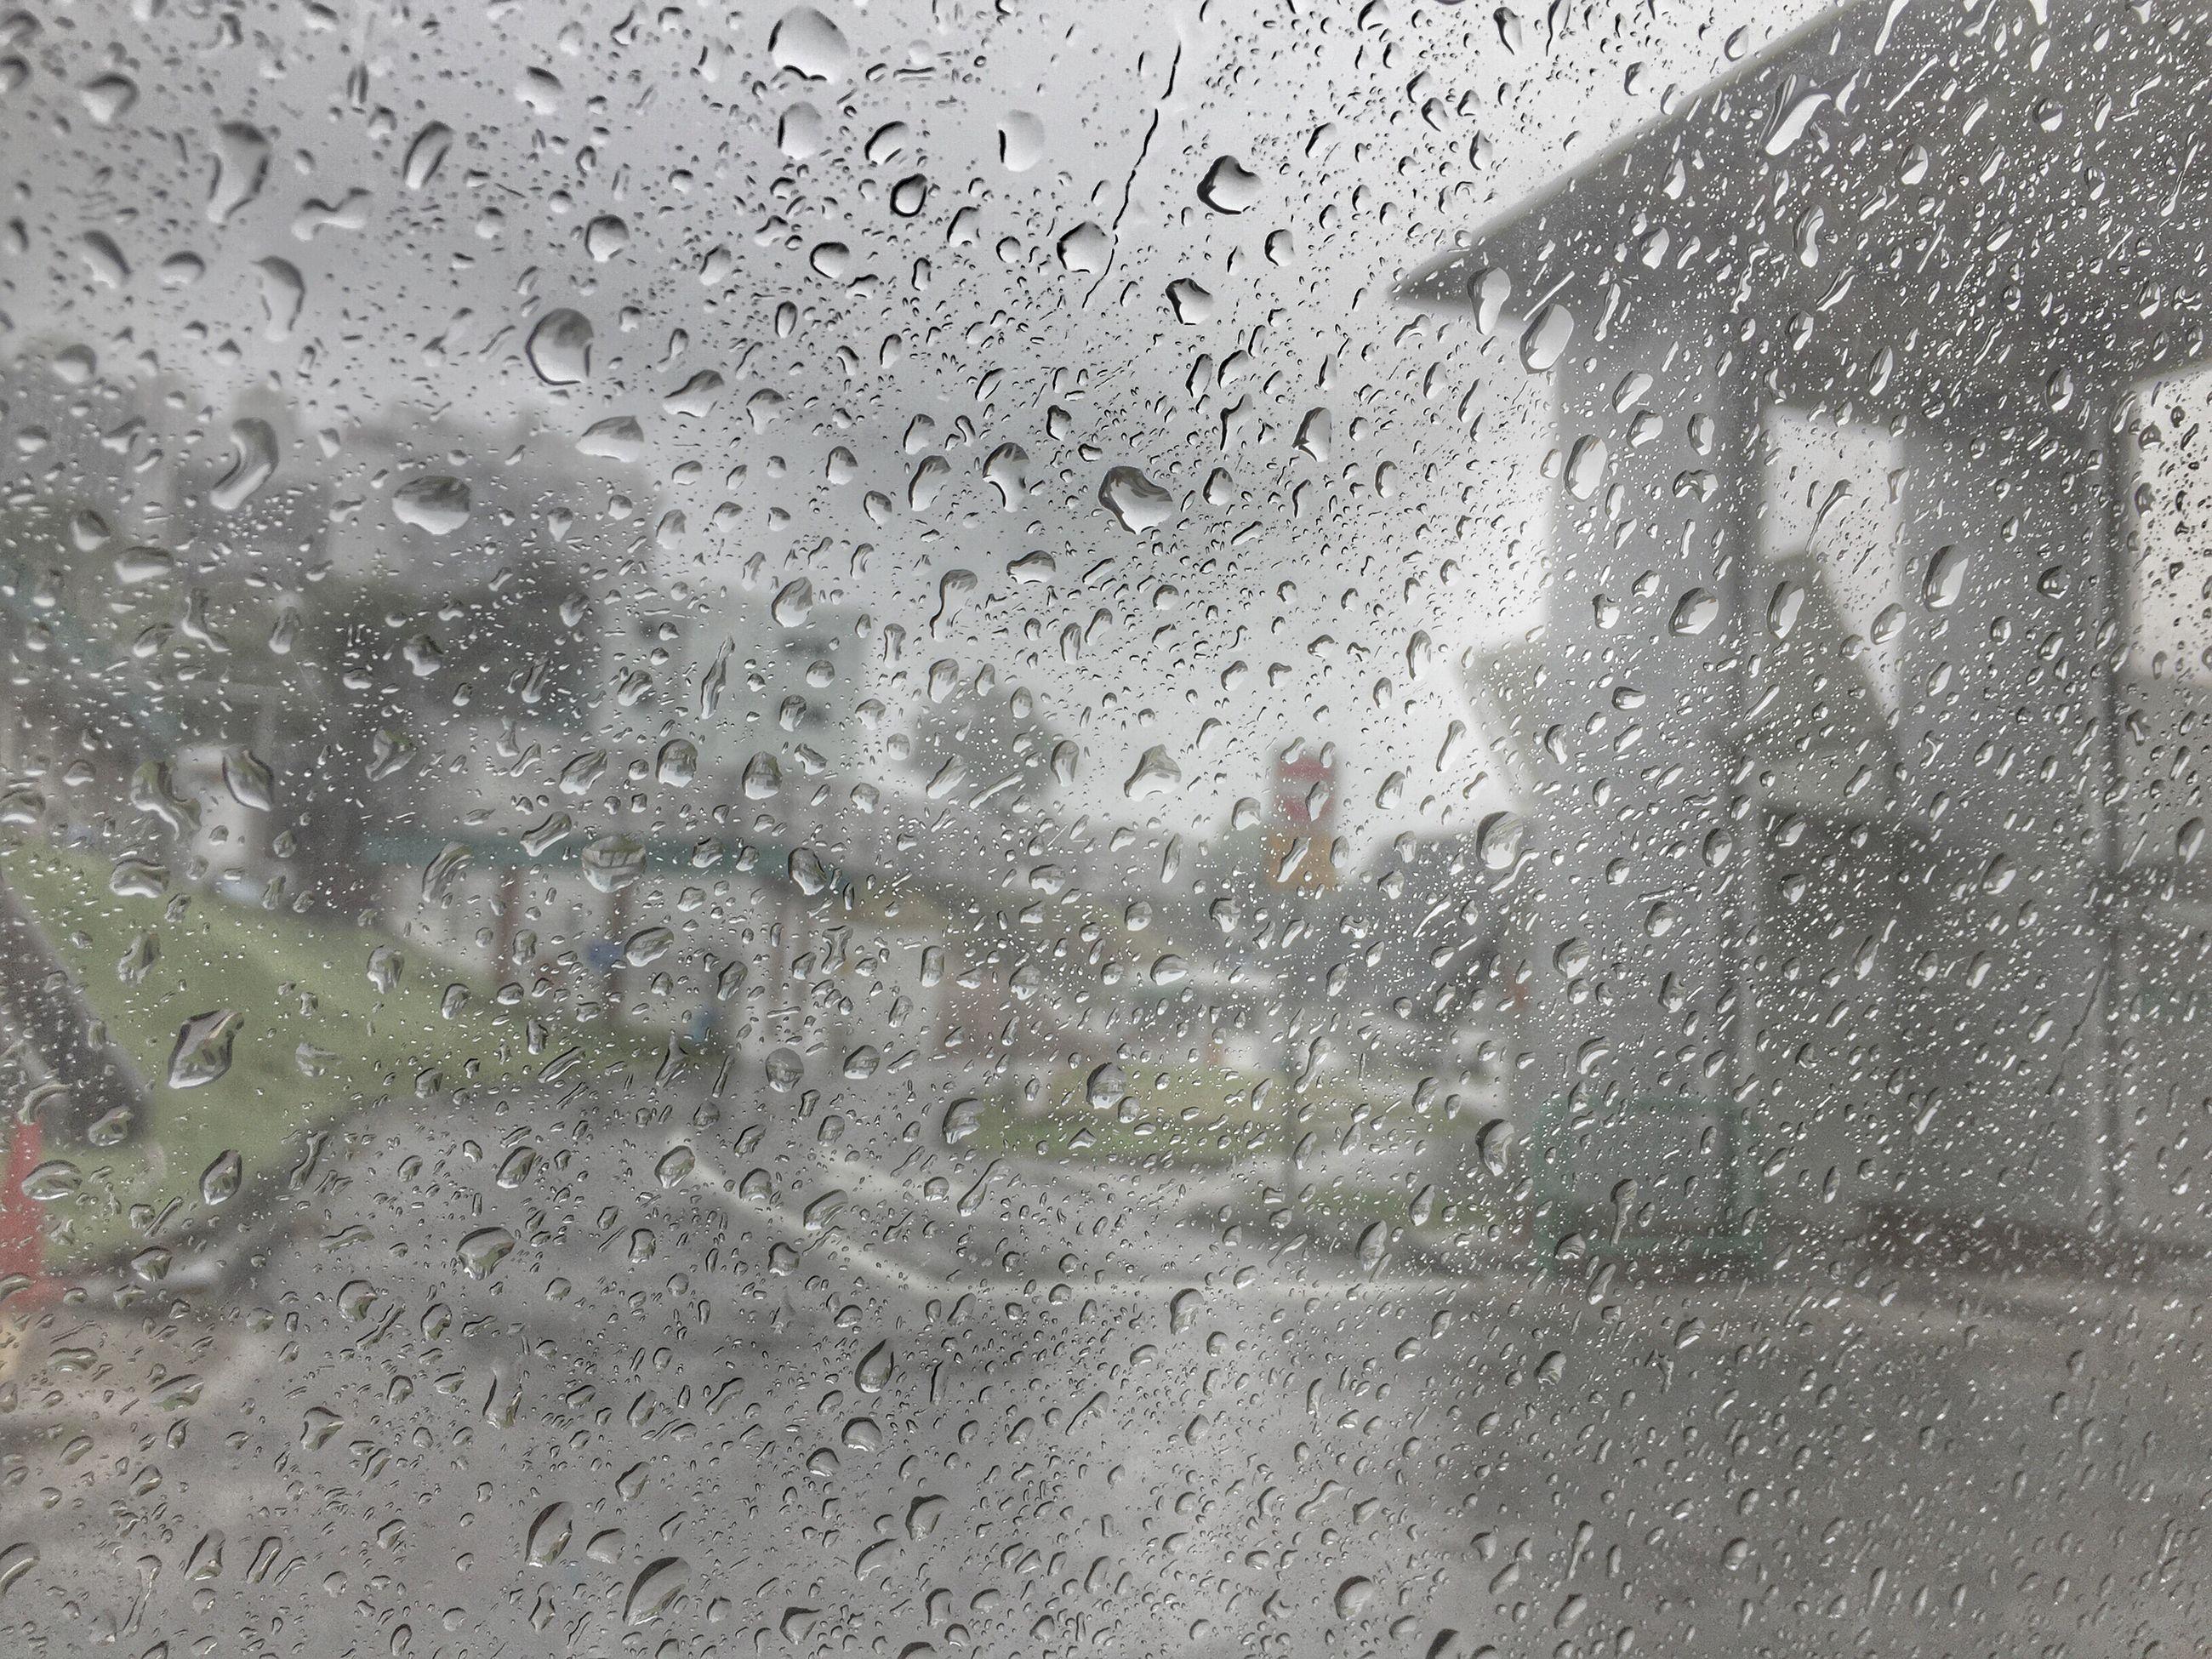 drop, wet, window, rain, transparent, glass - material, water, indoors, weather, raindrop, season, car, glass, monsoon, transportation, vehicle interior, sky, rainy season, full frame, mode of transport